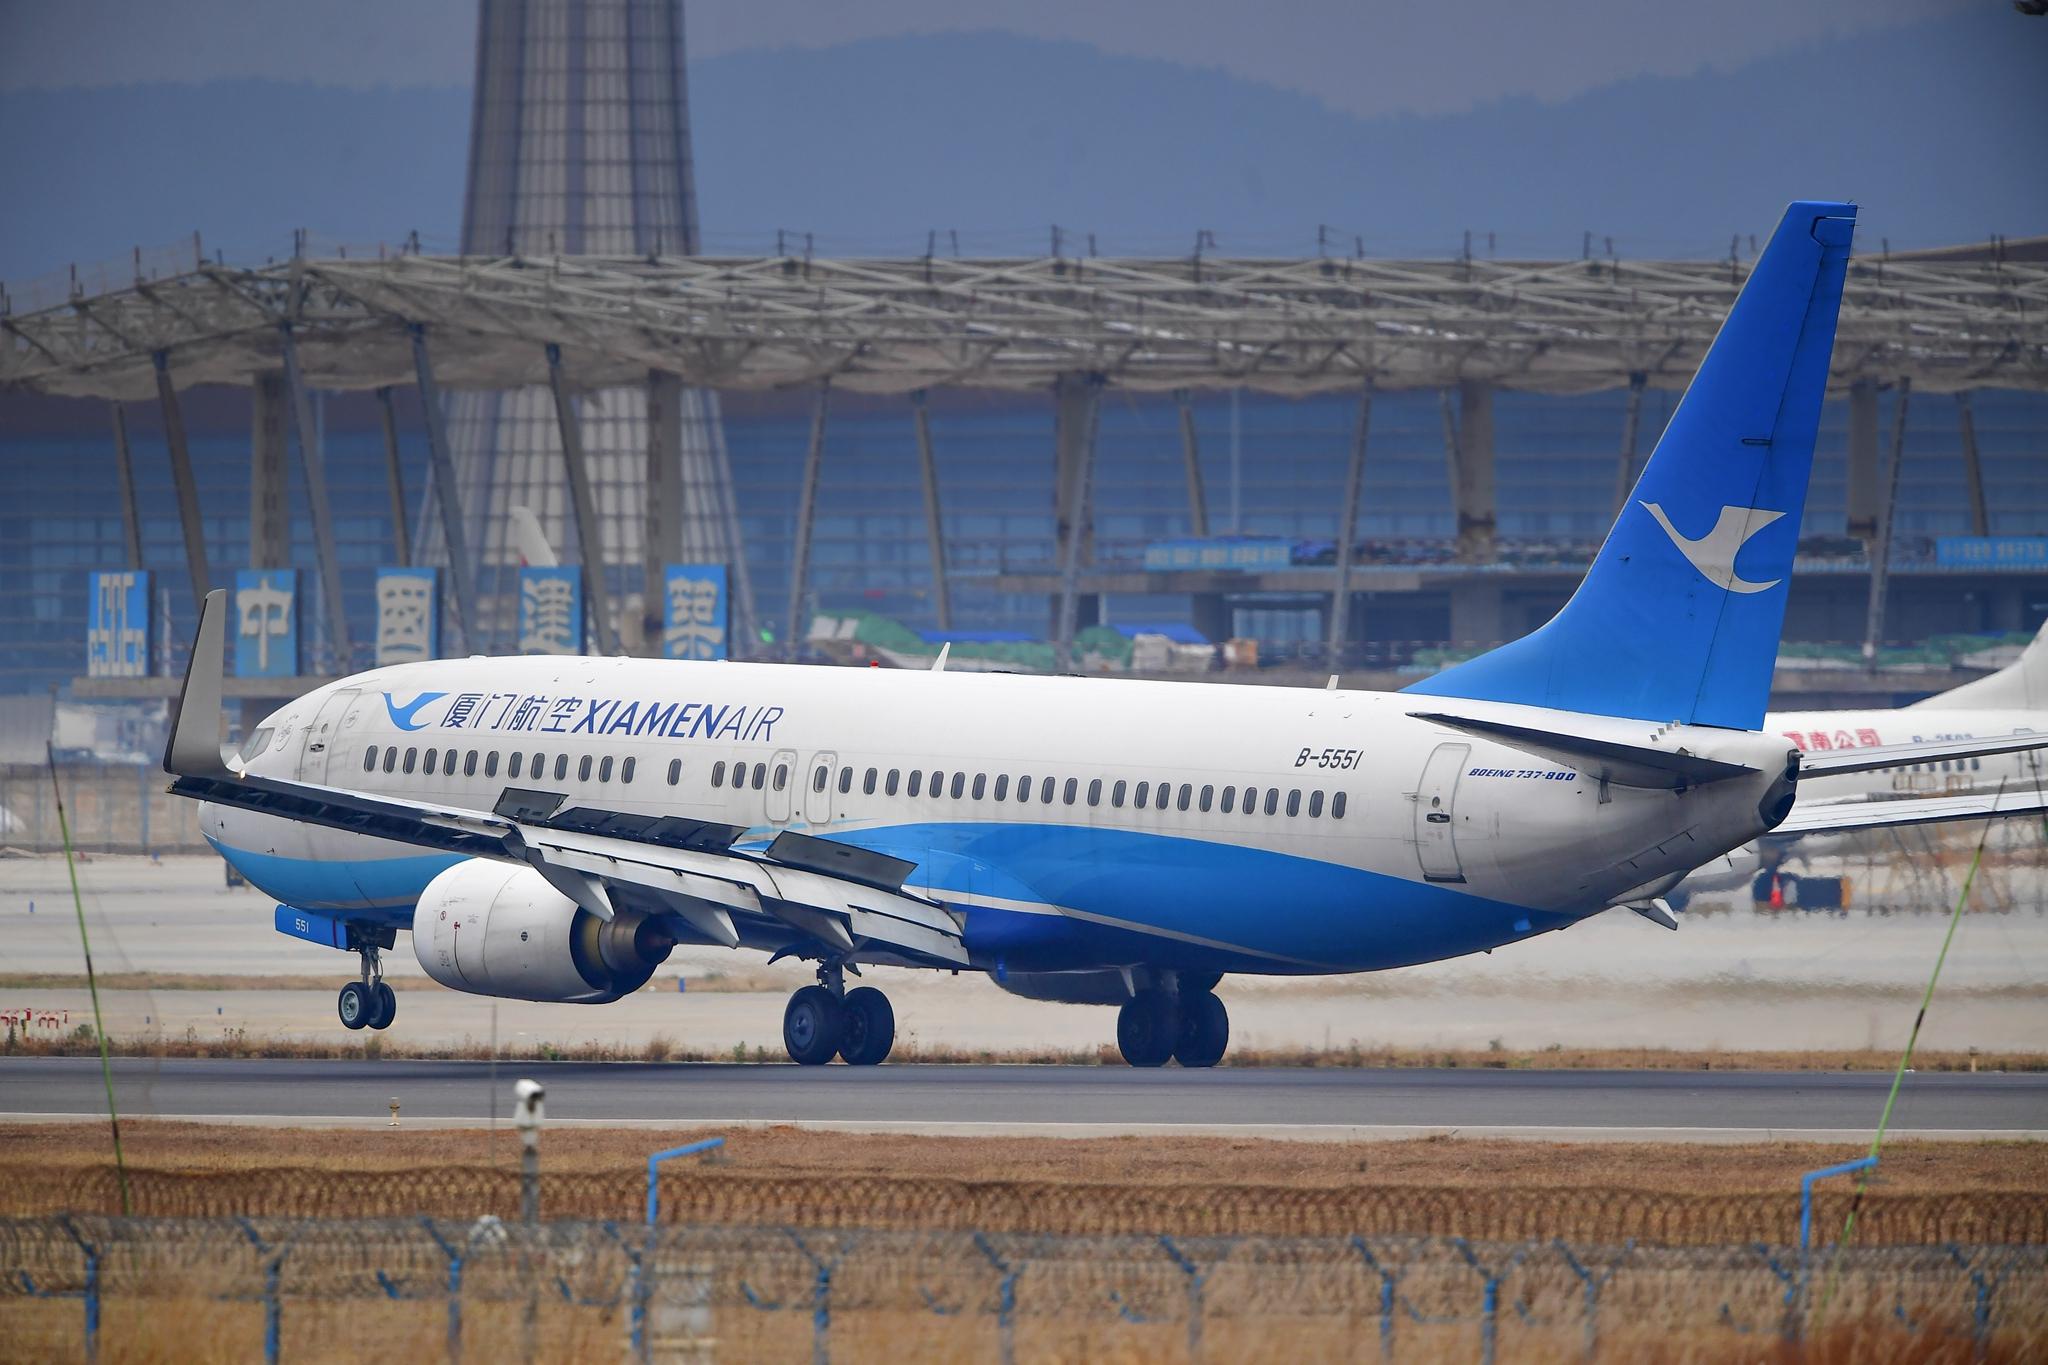 Re:[原创]KMG 庚子年初四再赴长水之约 都是似曾相识 都是熟悉的味道 BOEING 737-800 B-5551 中国昆明长水国际机场